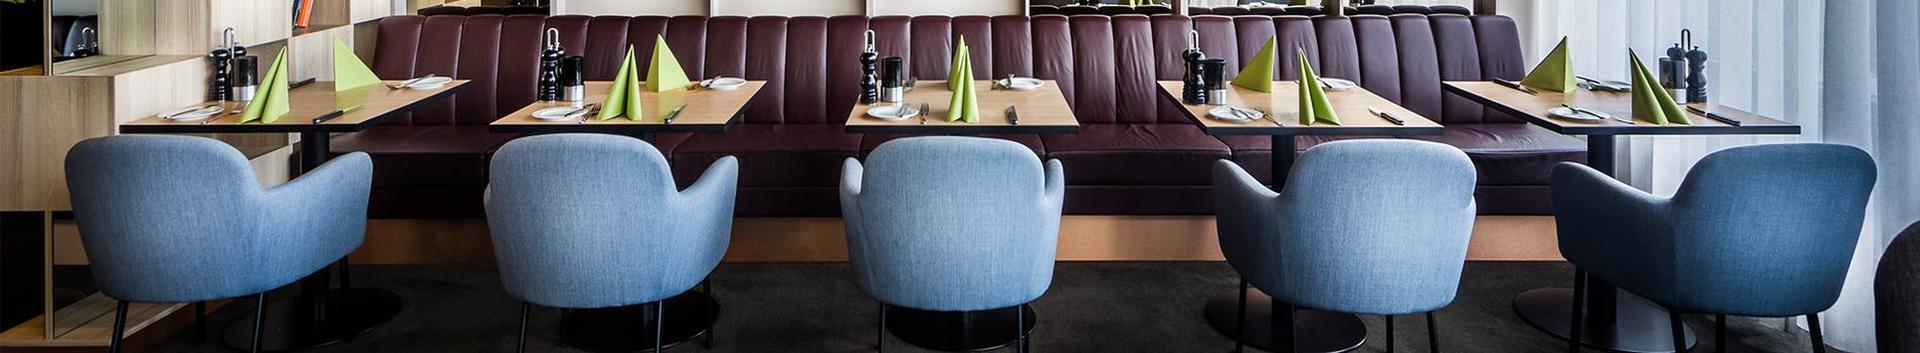 56101_toitlustus-restoran-jm-_29395151_xl.jpg